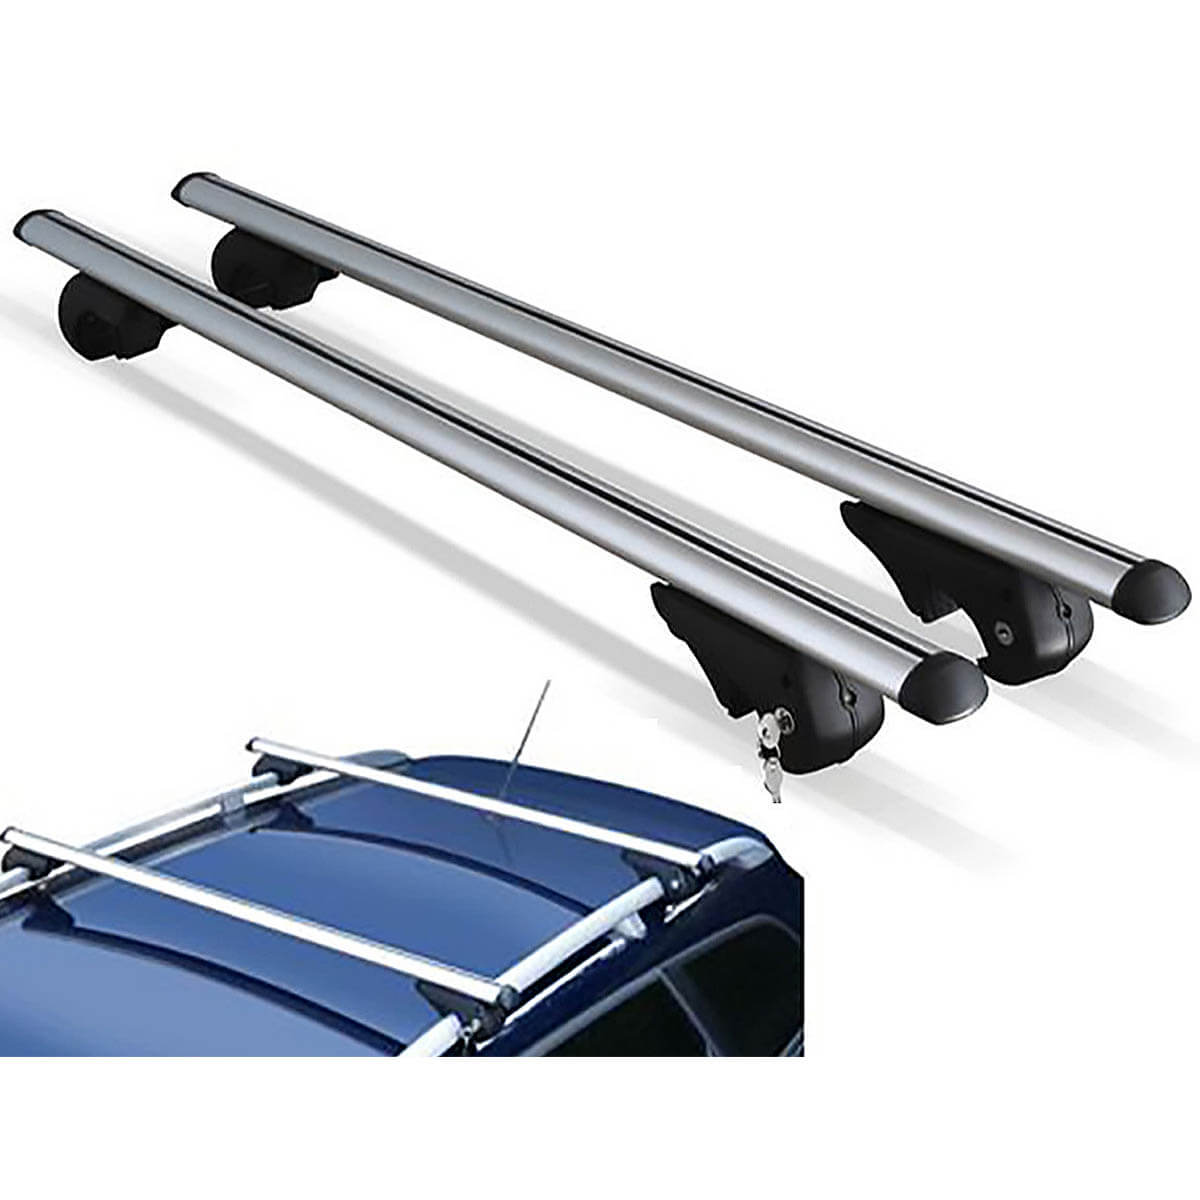 Travessa rack de teto Belluno Kiussi com chave I30 CW 2011 e 2012